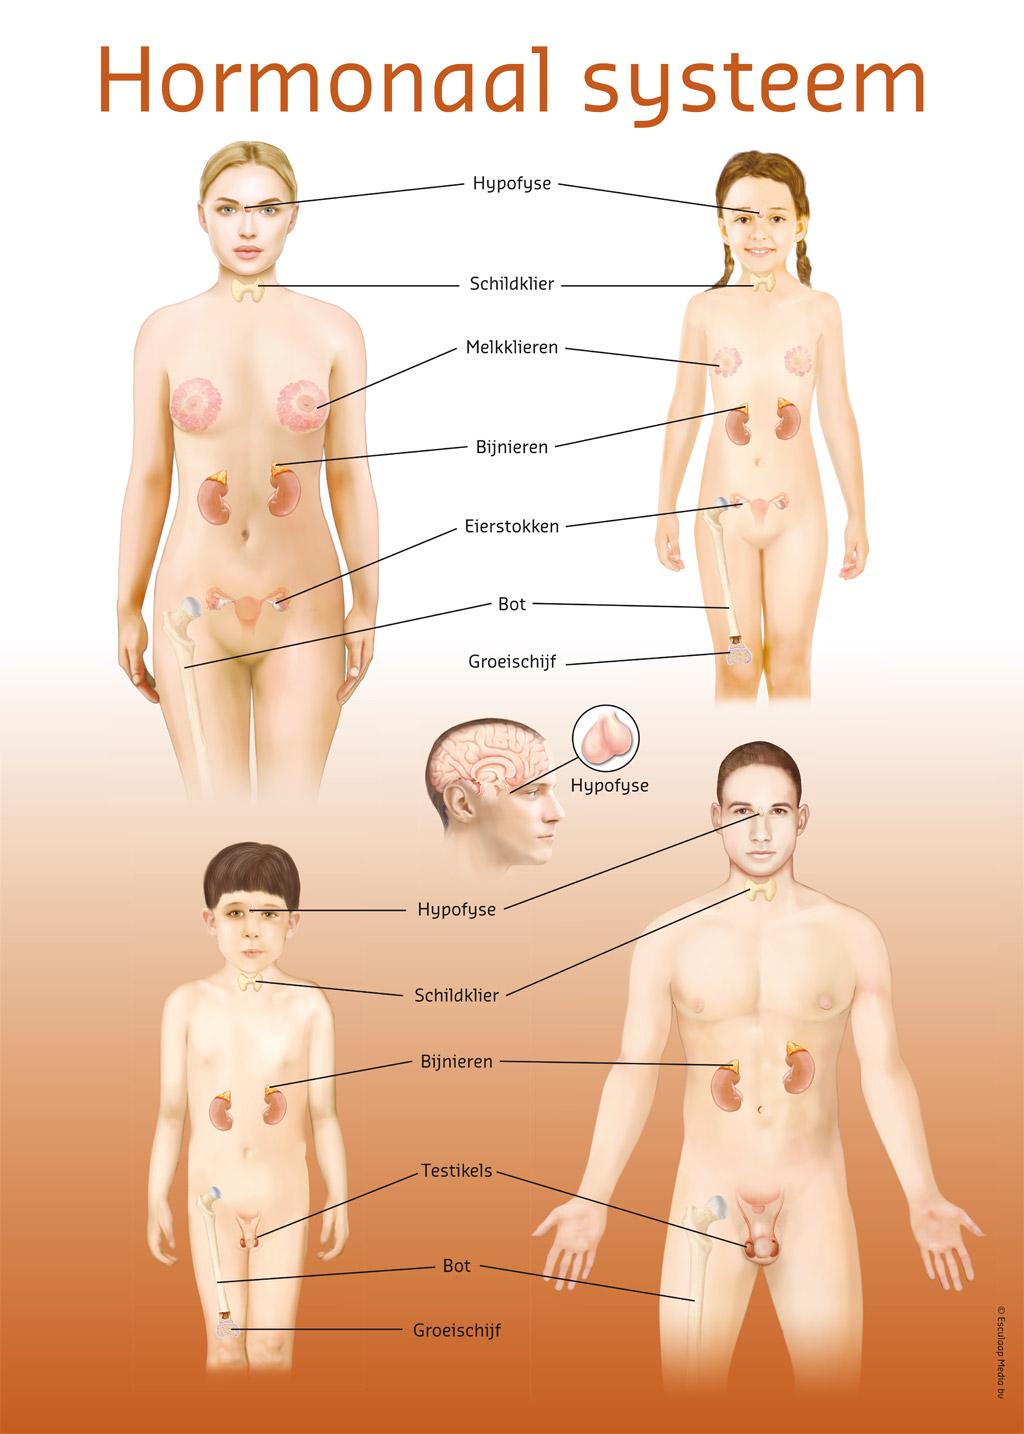 Hormonale stelsel - Poster